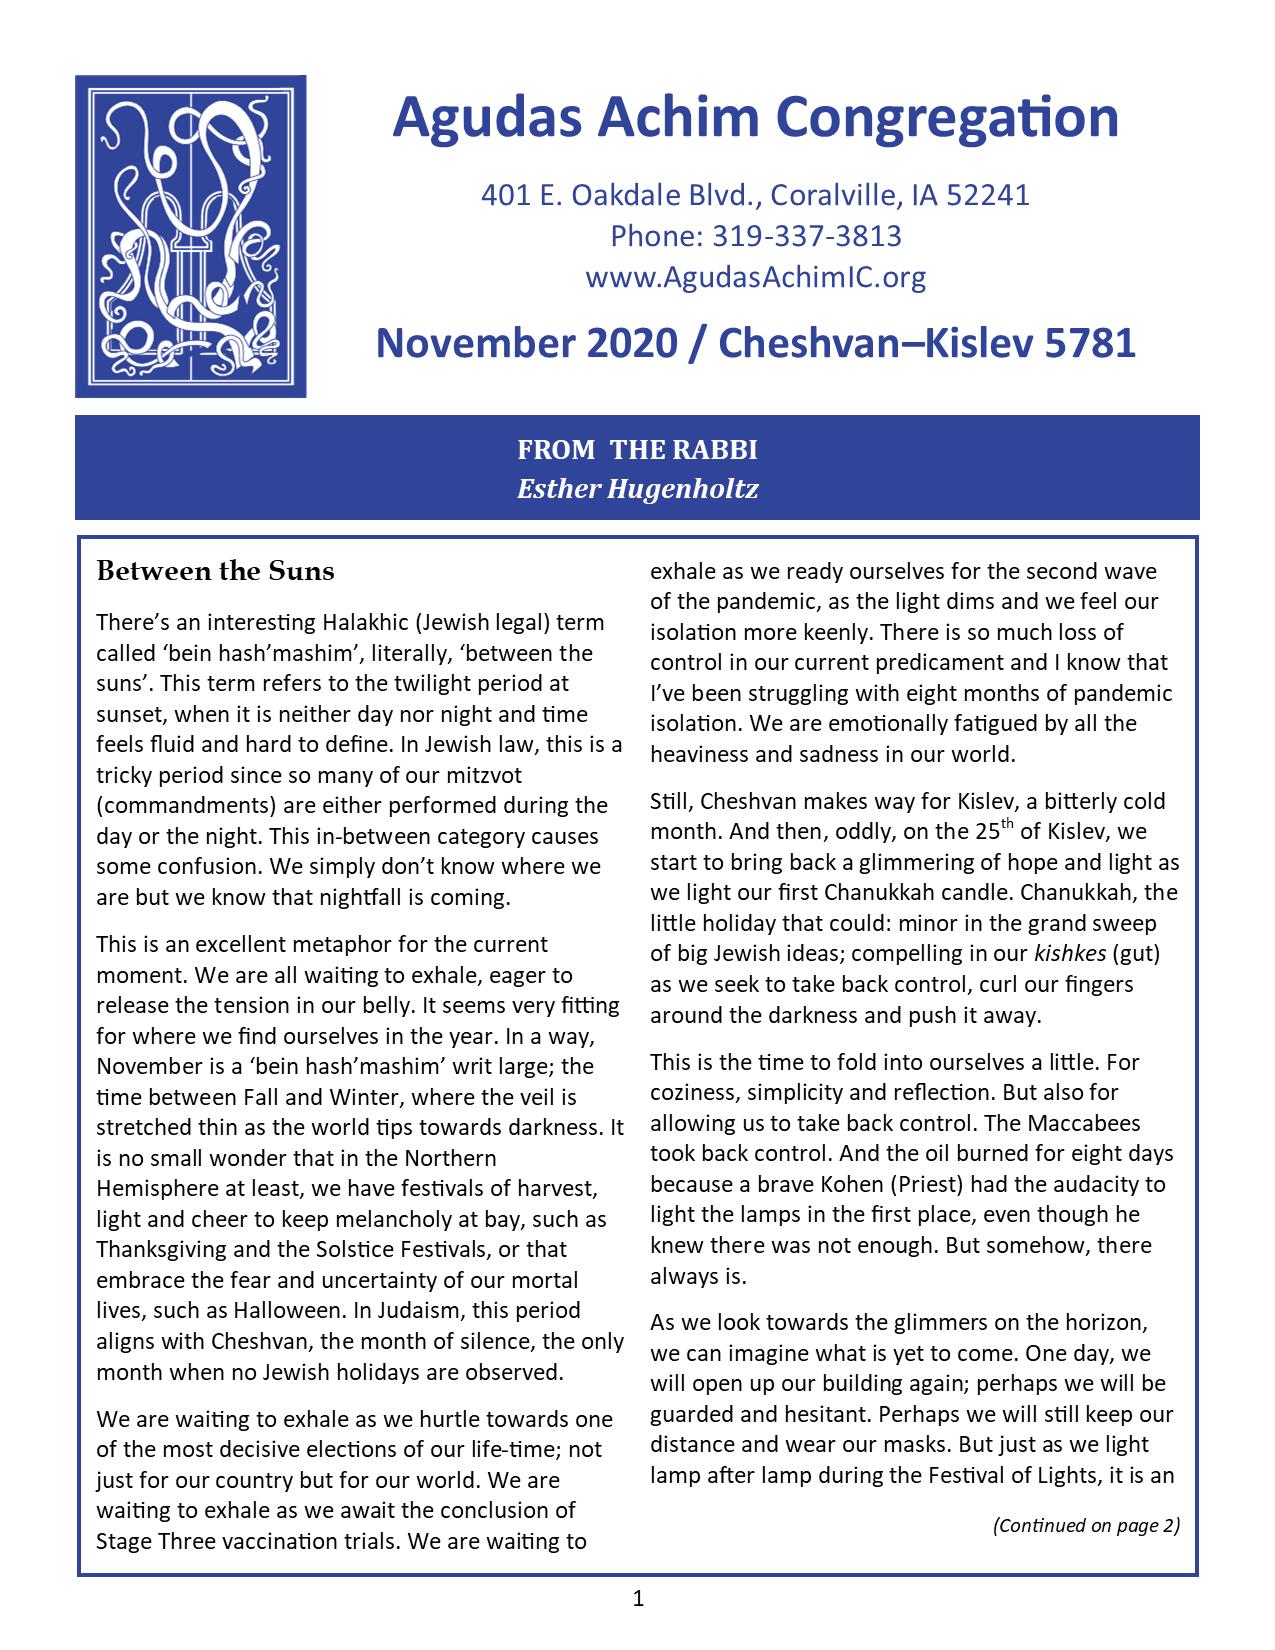 November 2020 News Bulletin